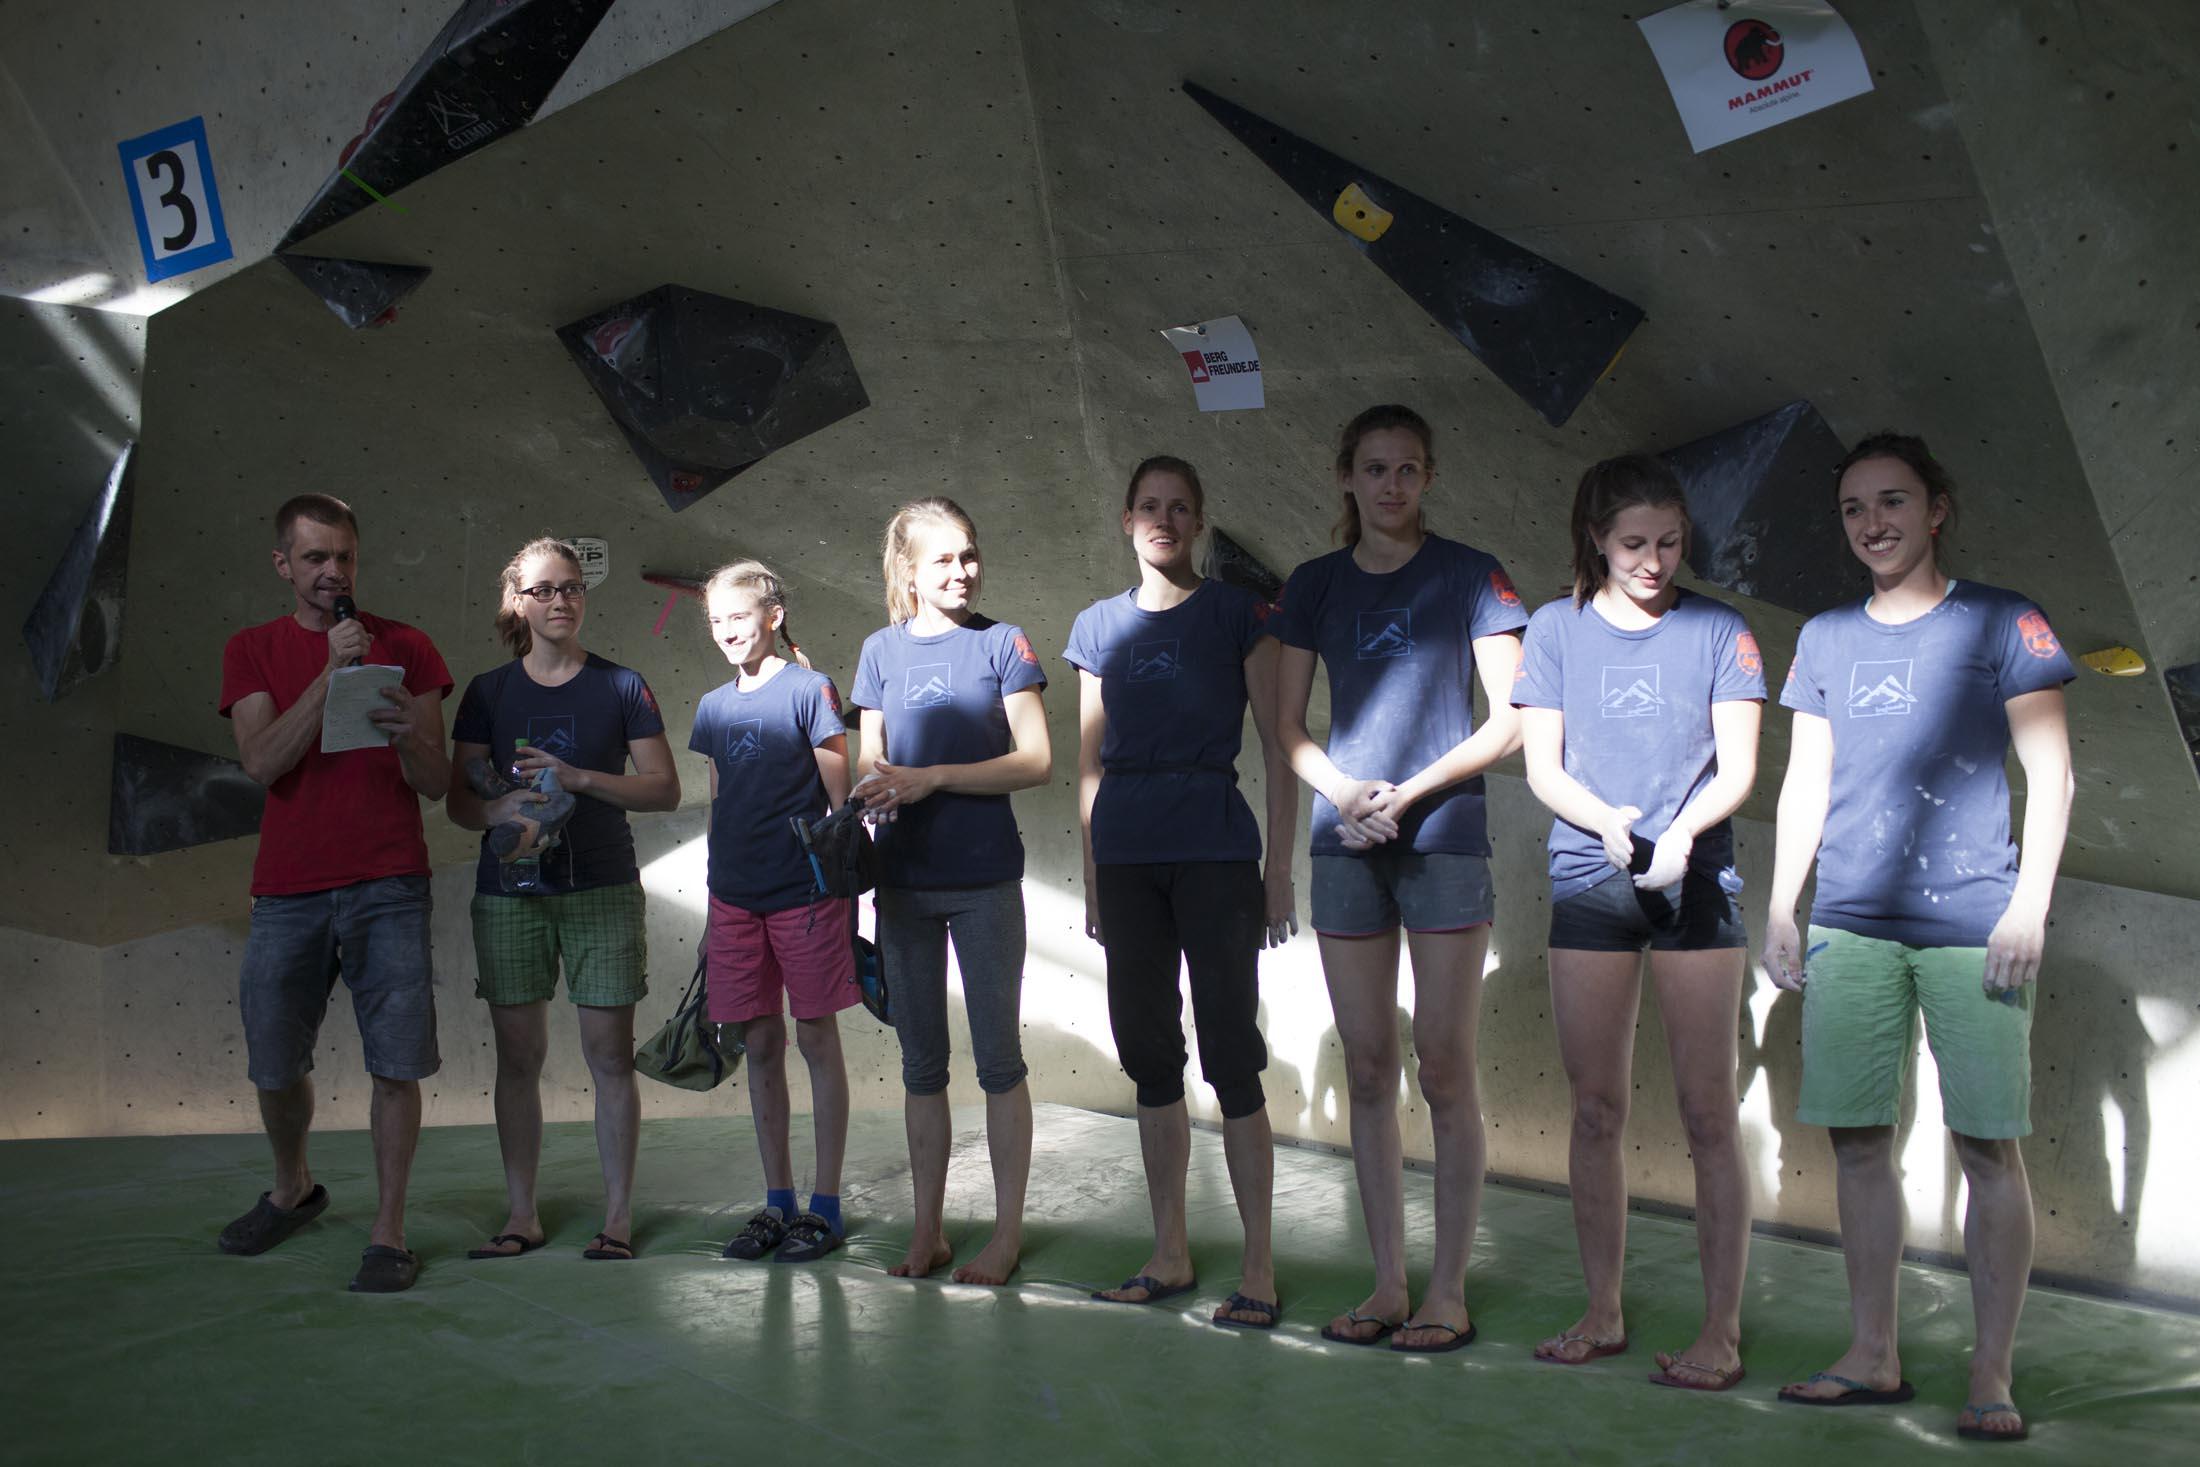 Finale, internationaler bouldercup Frankenjura 2016, BLOCKHELDEN Erlangen, Mammut, Bergfreunde.de, Boulderwettkampf07092016444